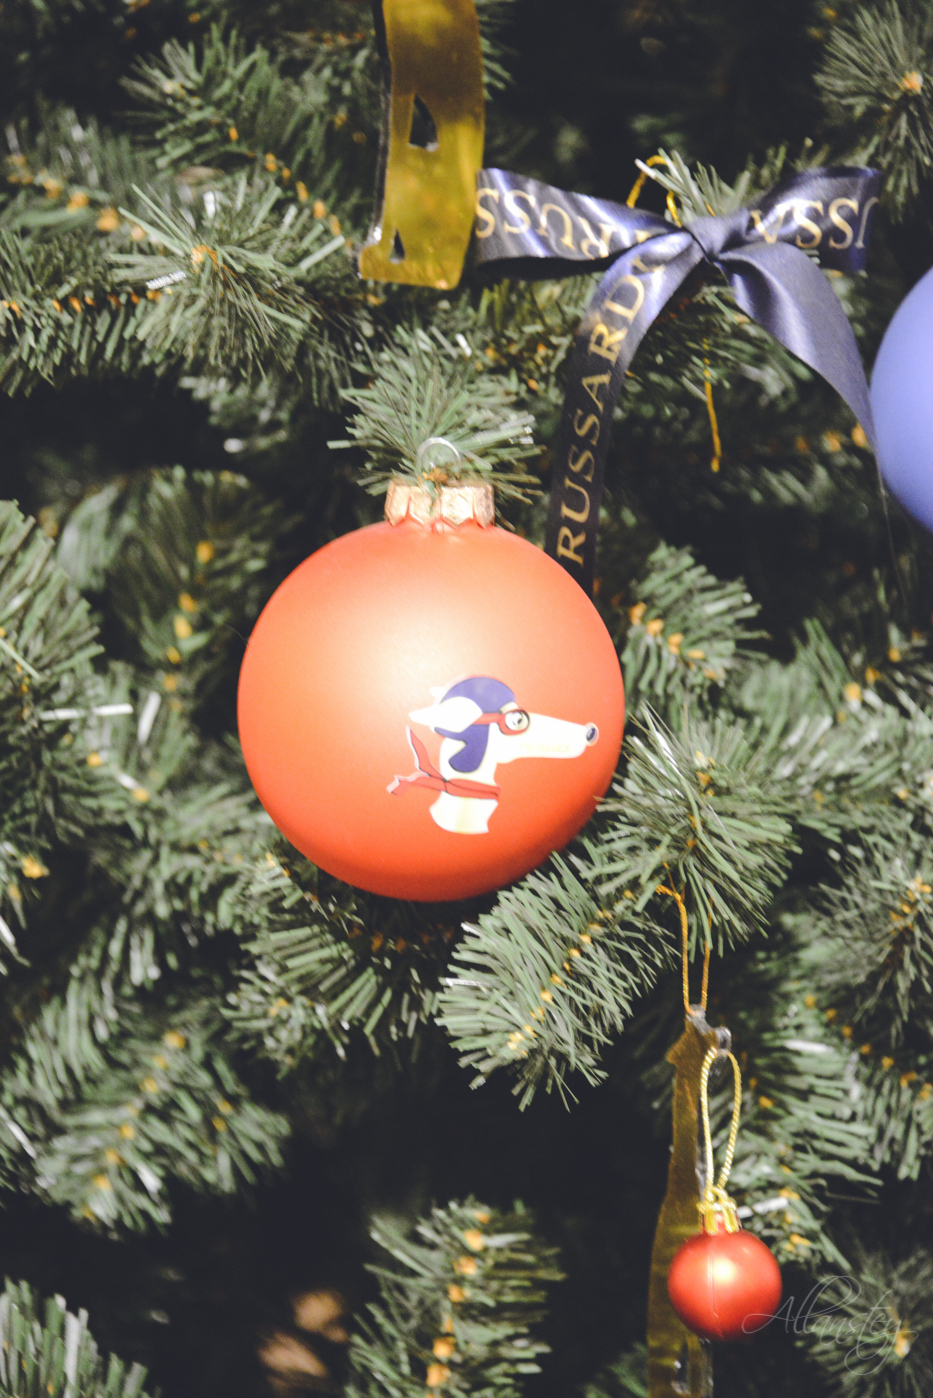 Red Christmas balls decorations on Christmas tree